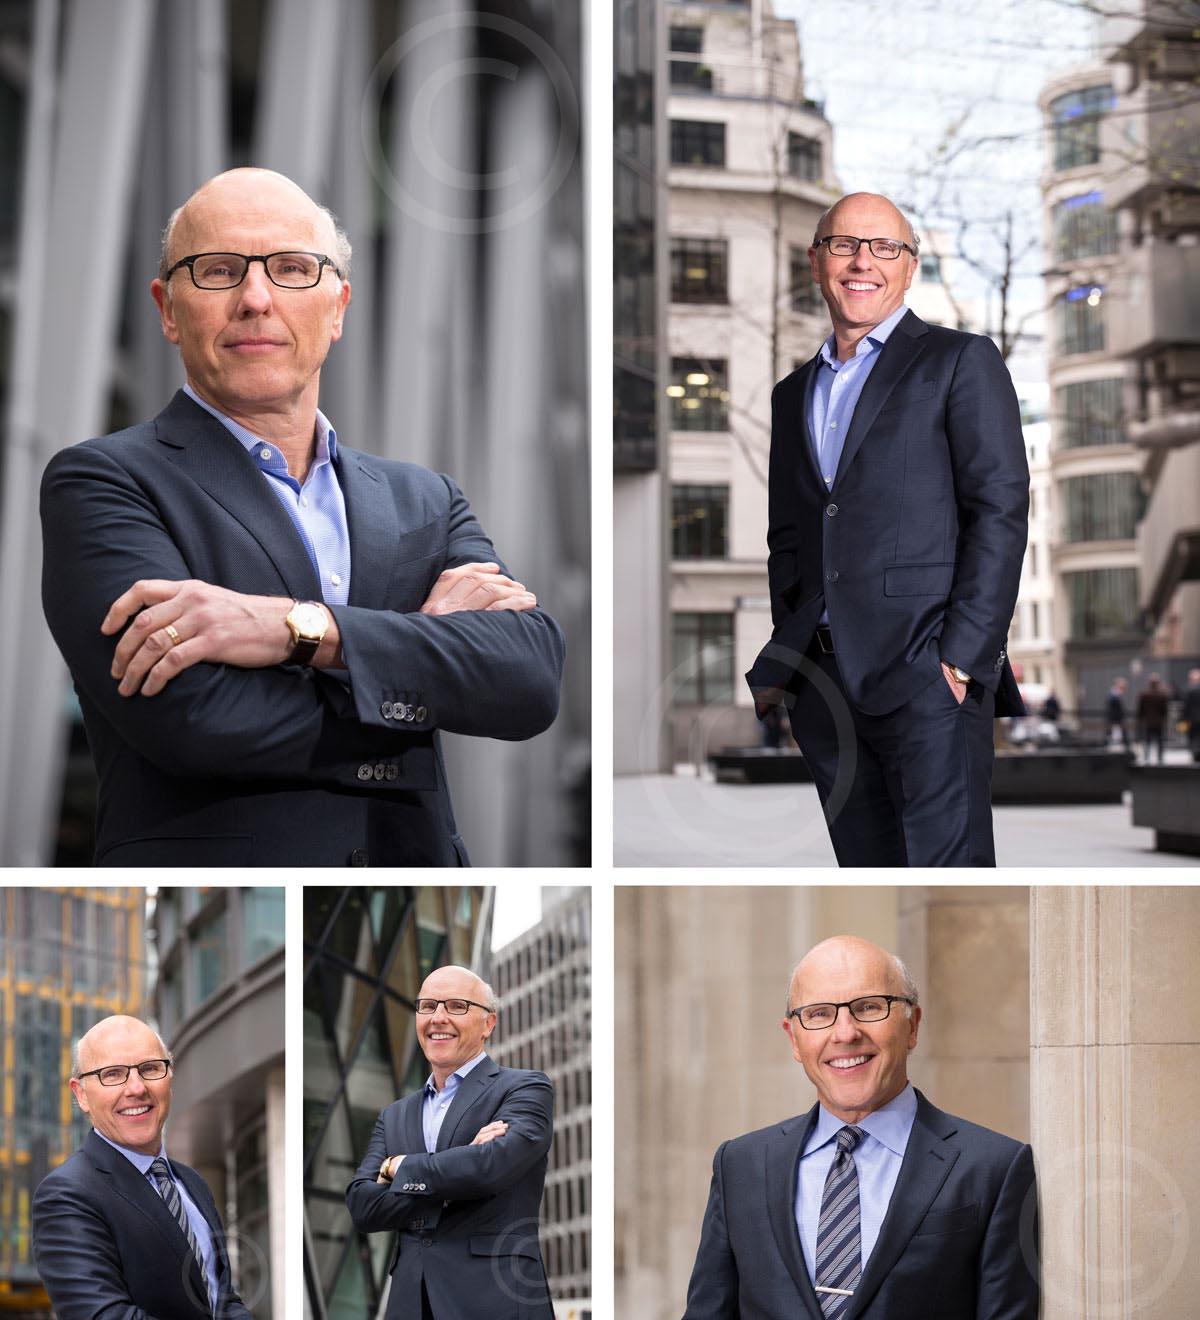 Whiteoak-davidmccourt-london-yorkshire-corporate-business-portraits-photography